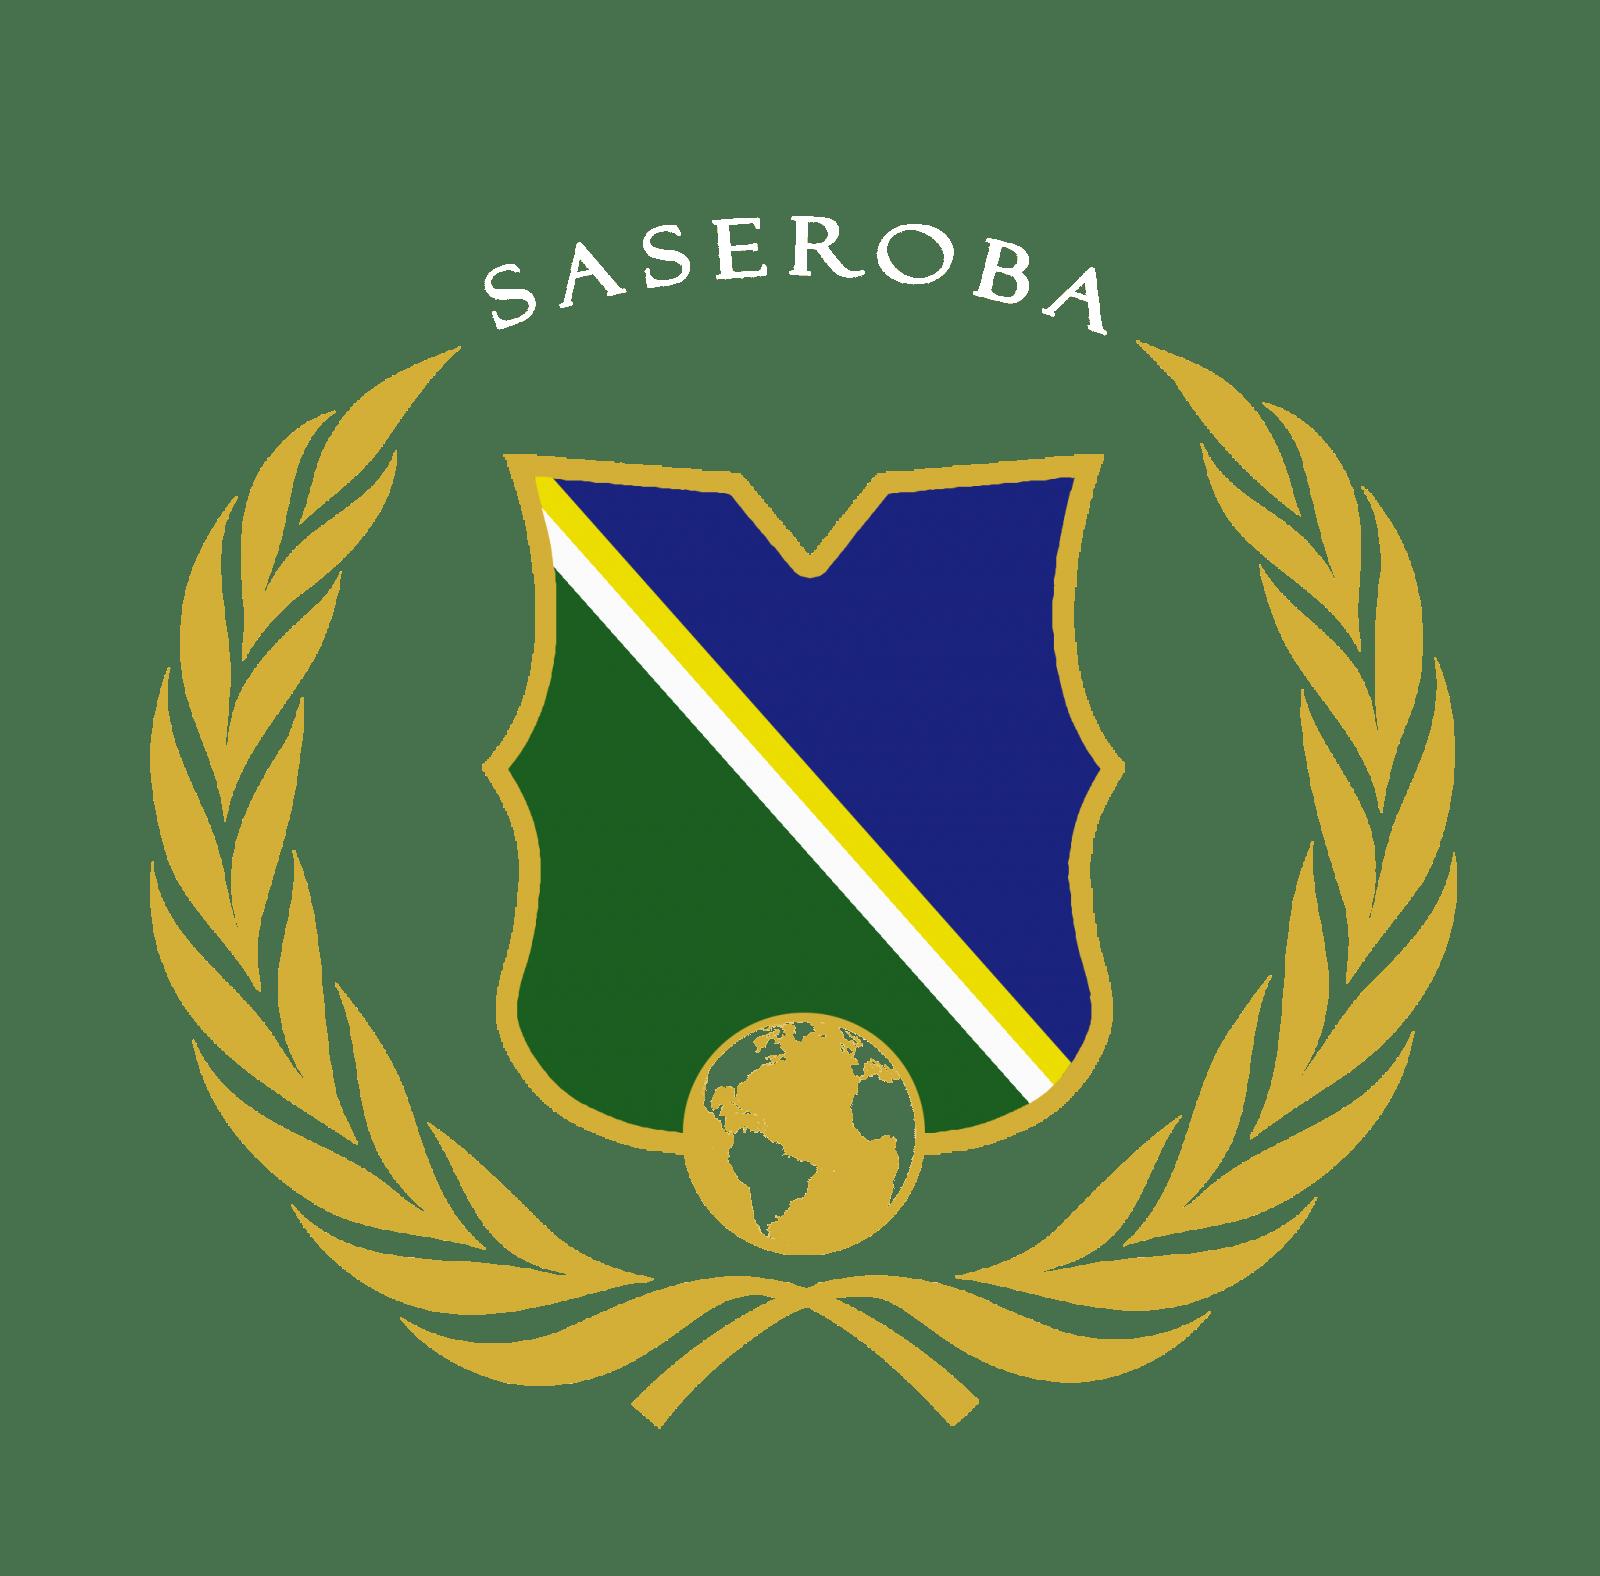 Saseroba